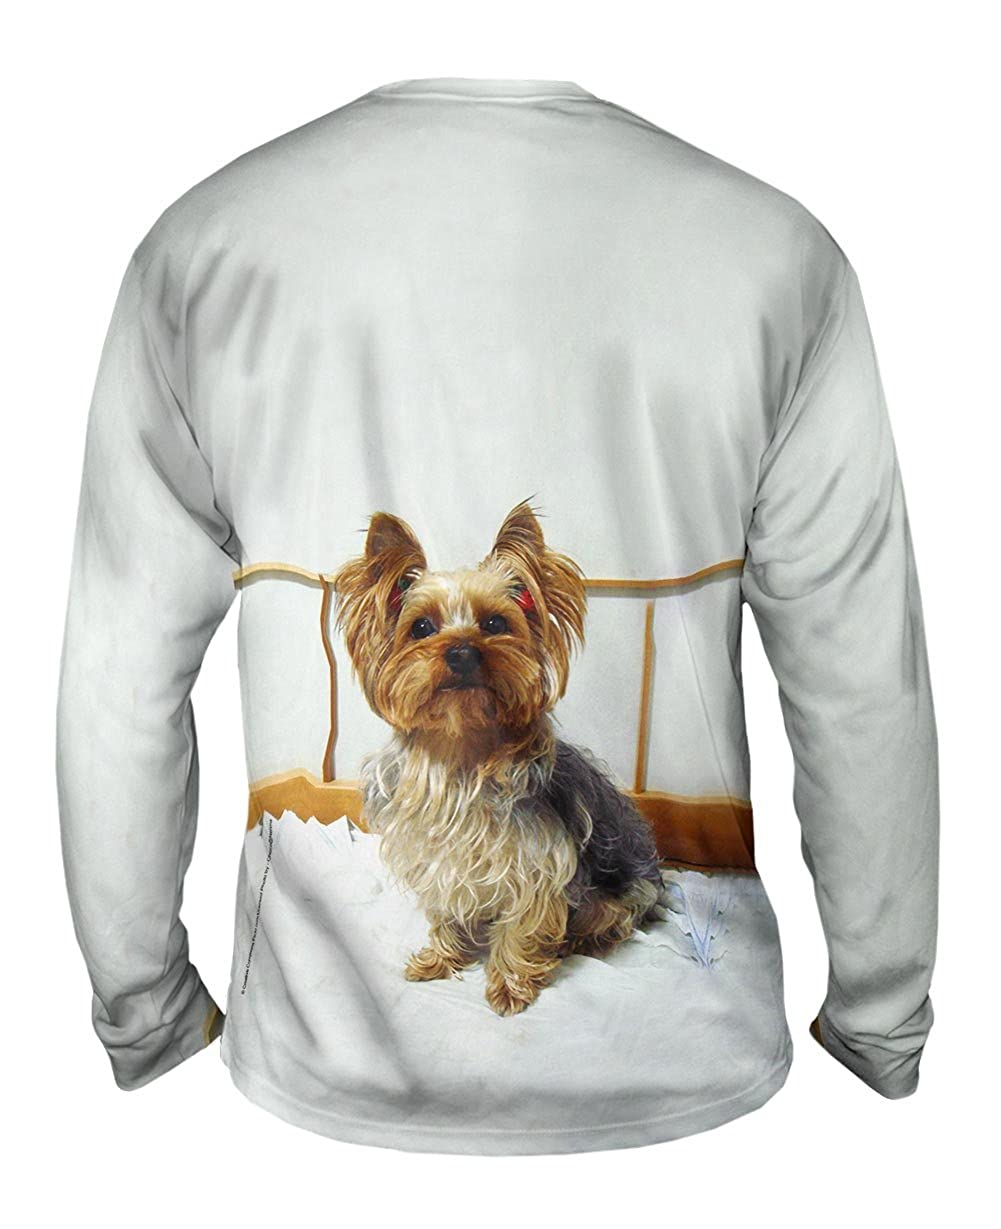 TShirt Mens Long Sleeve Fancy Yorkshire Terrier Yizzam